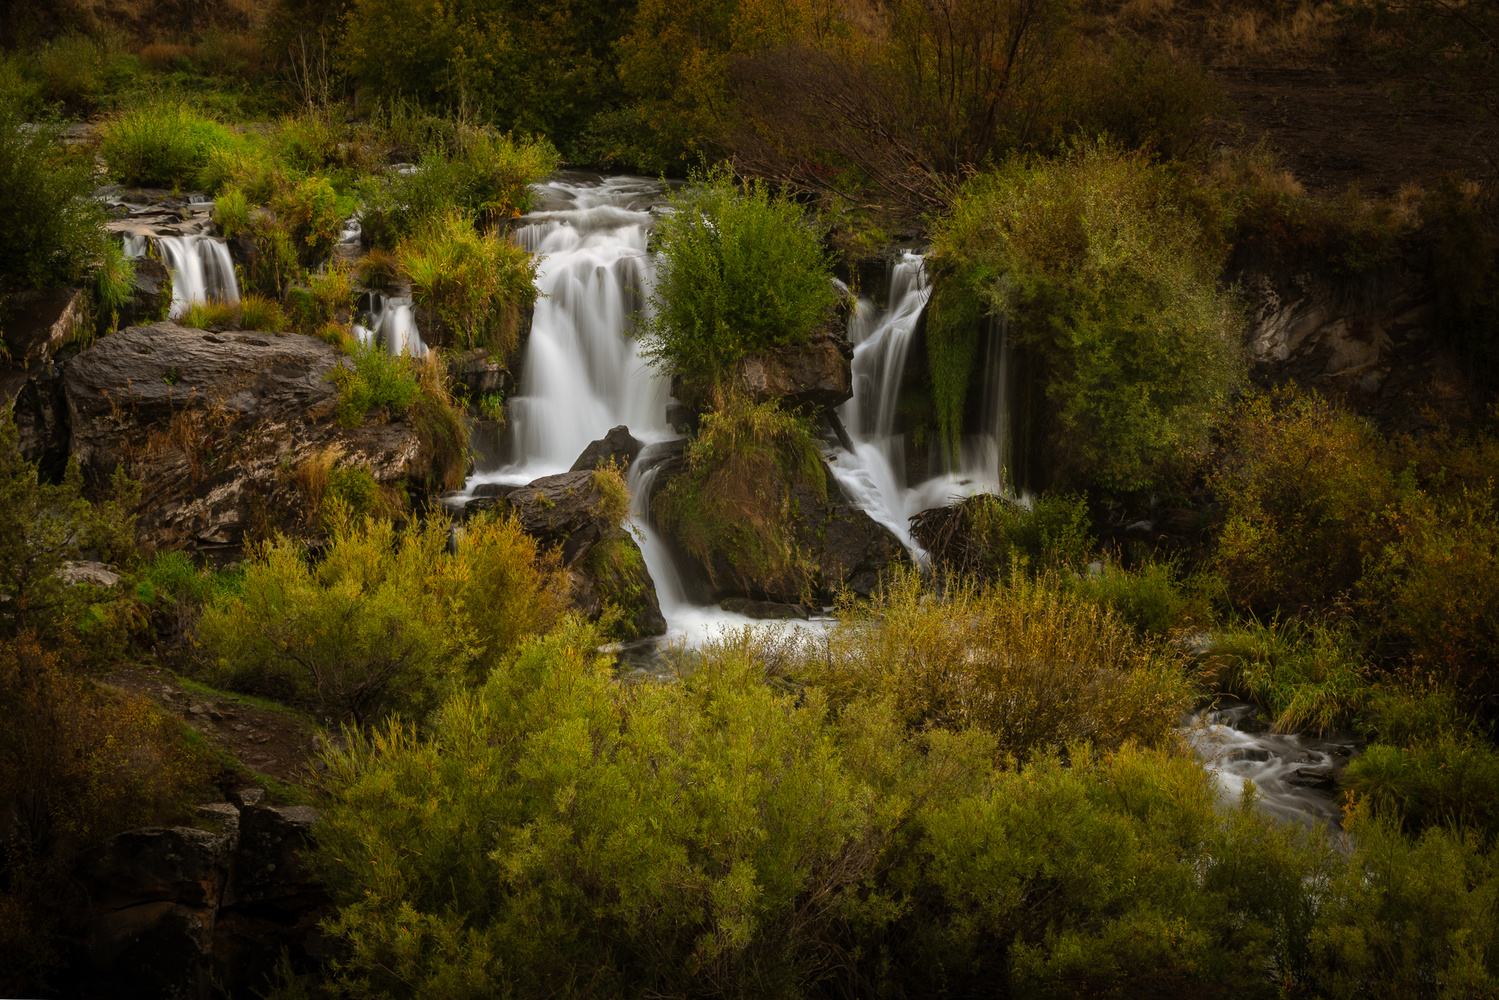 Cline Falls by Ryan Mense